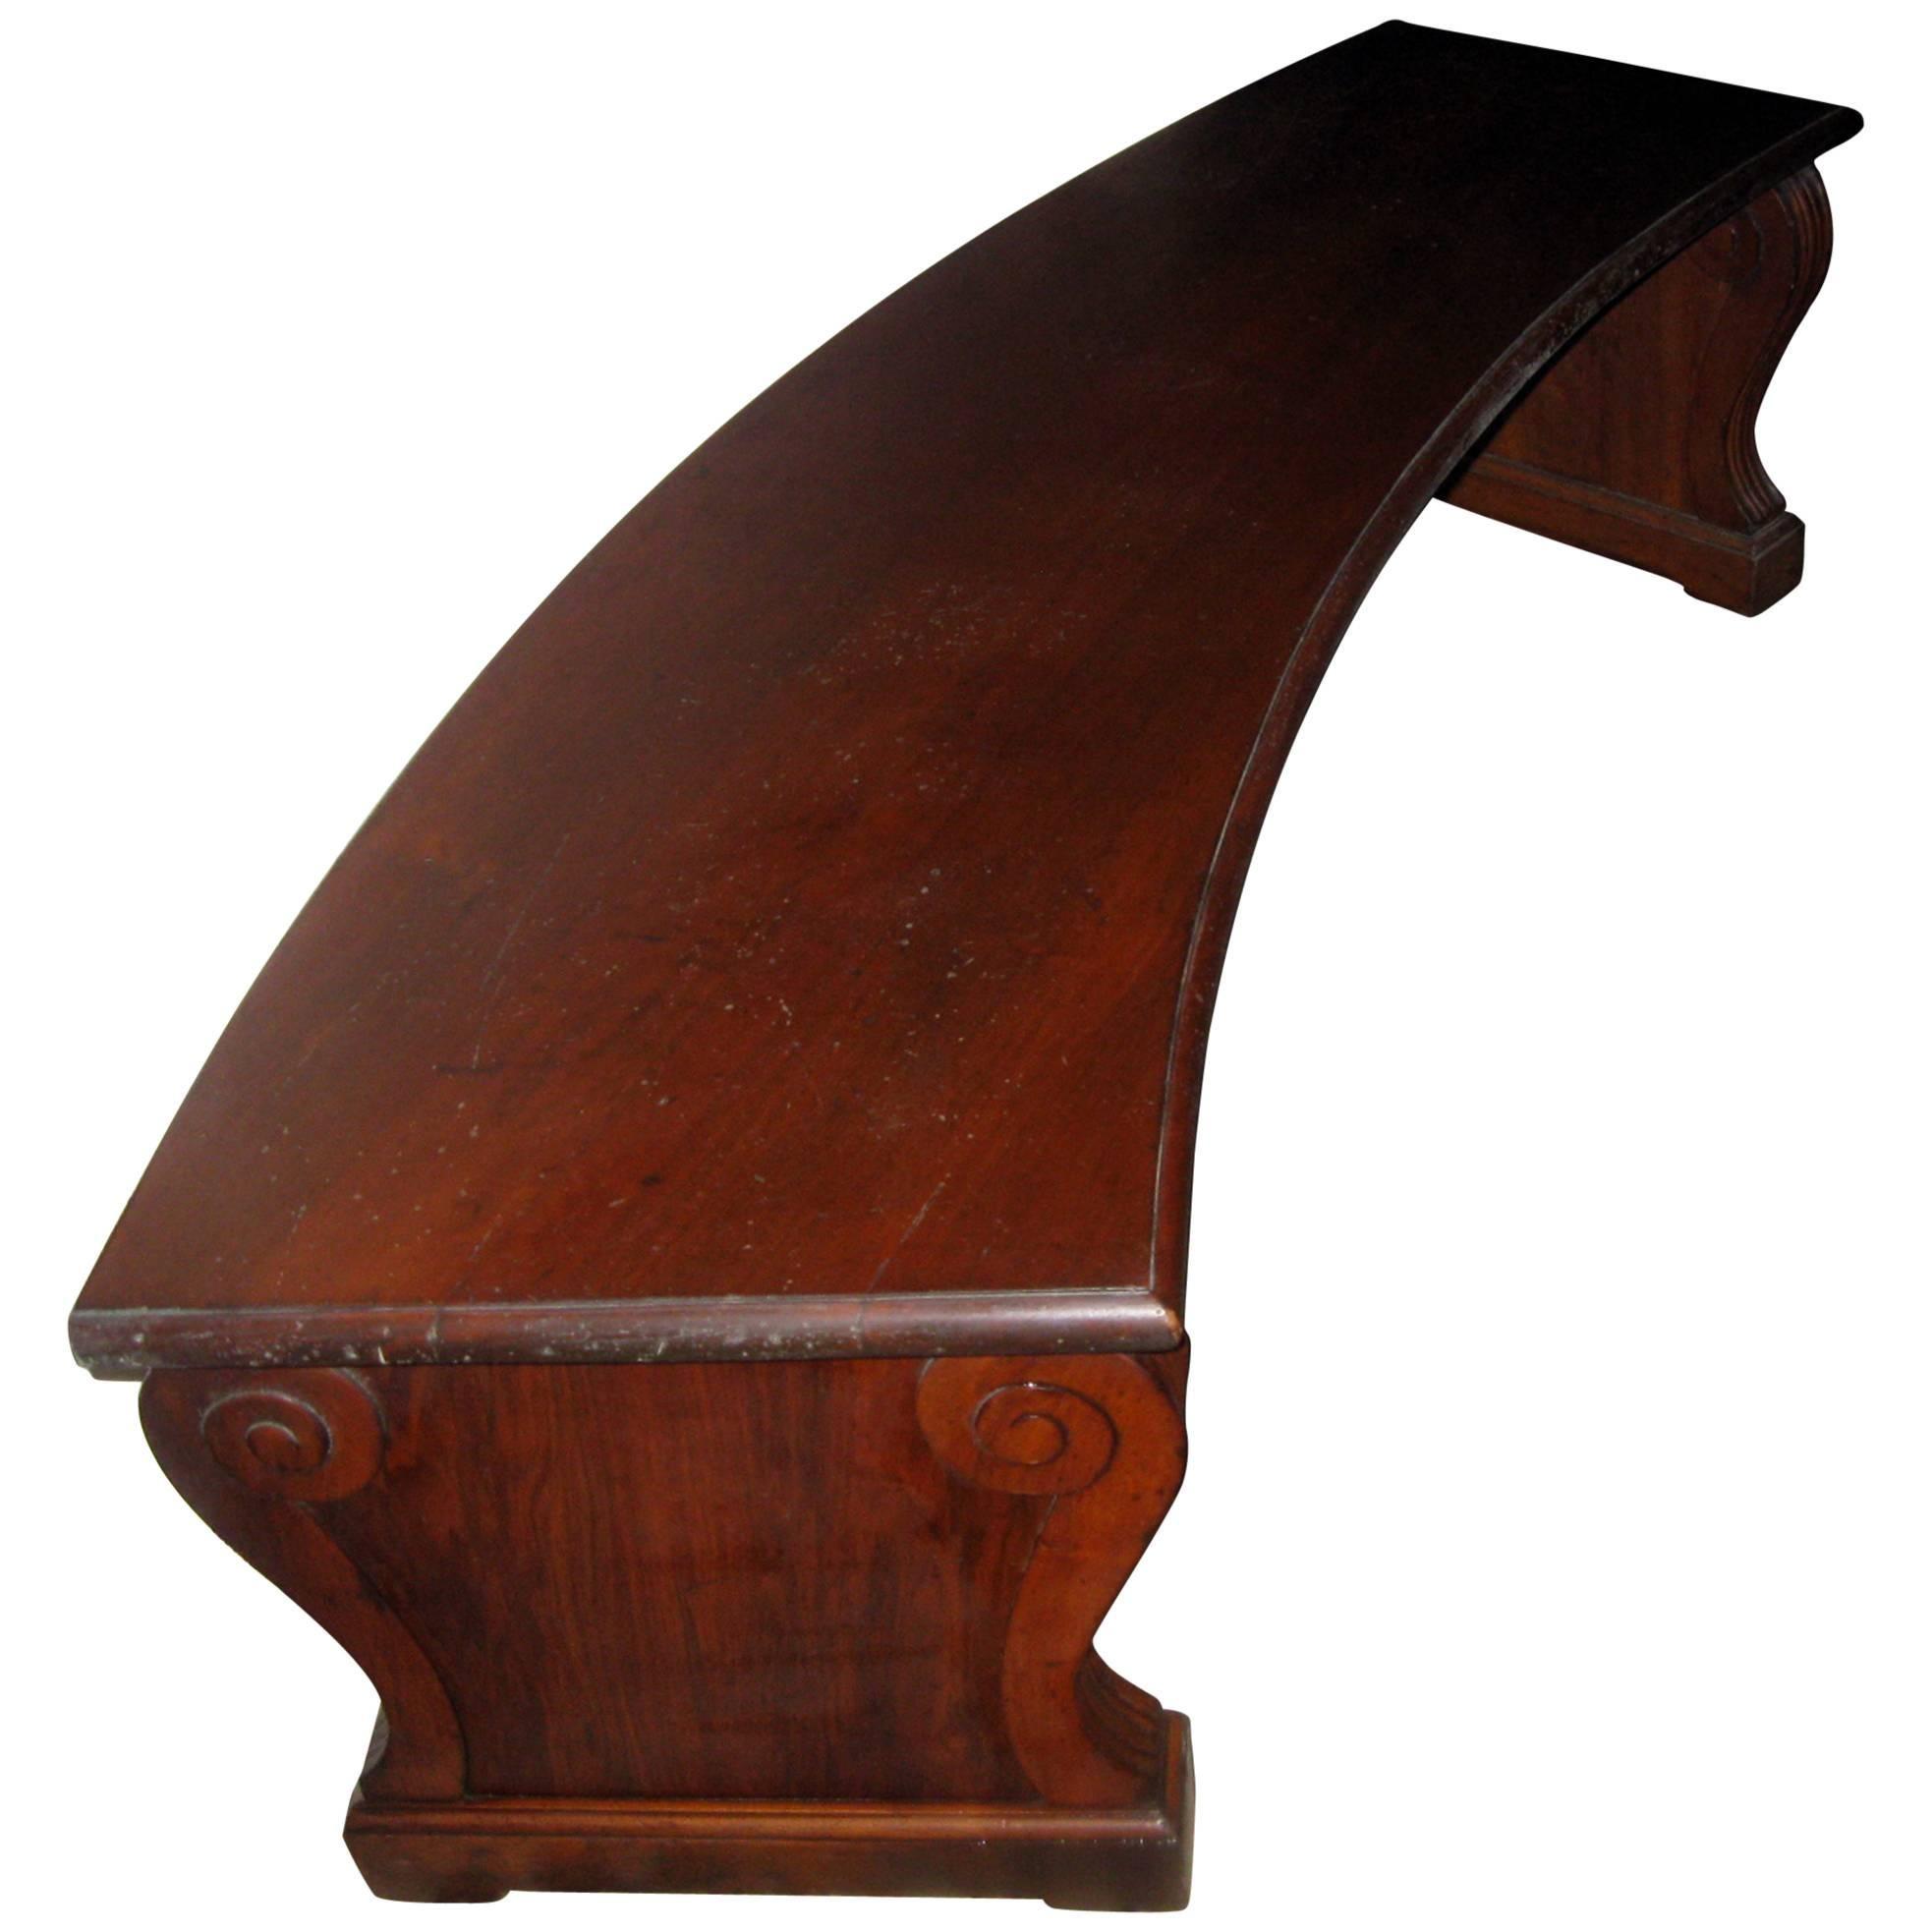 19th century Regency Period Curved Walnut Bench